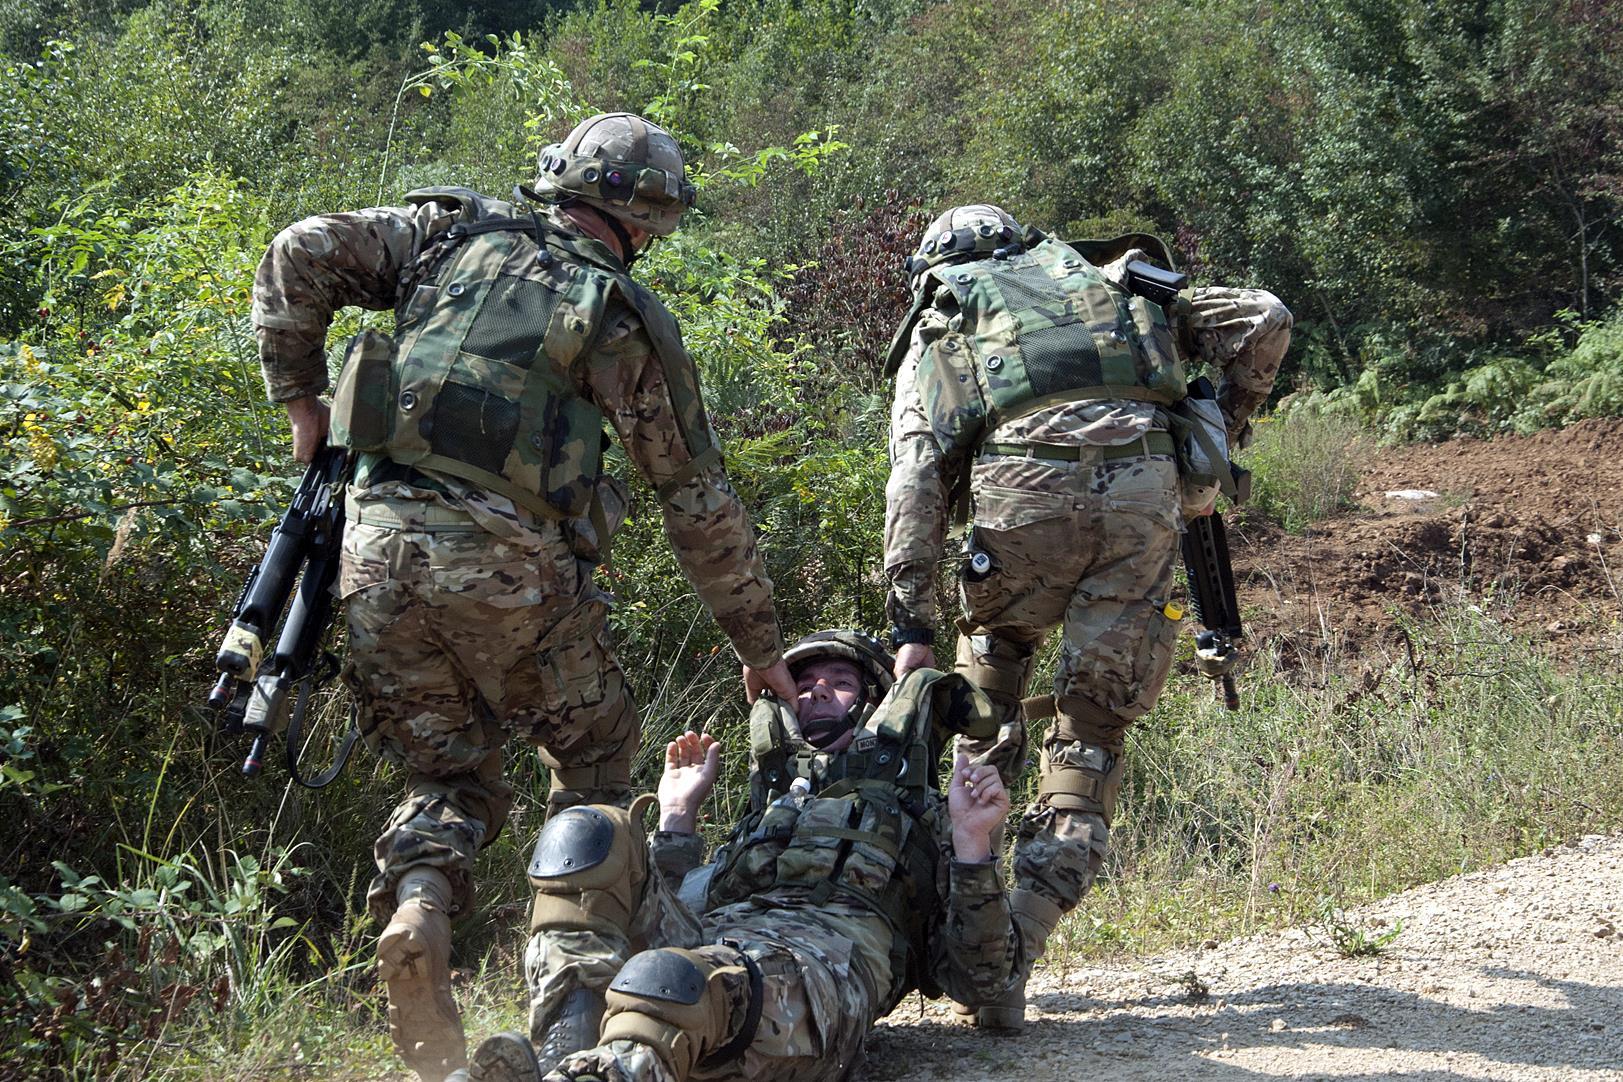 Spec Ops Wallpaper Hd U S Department Of Defense Gt Photos Gt Photo Gallery